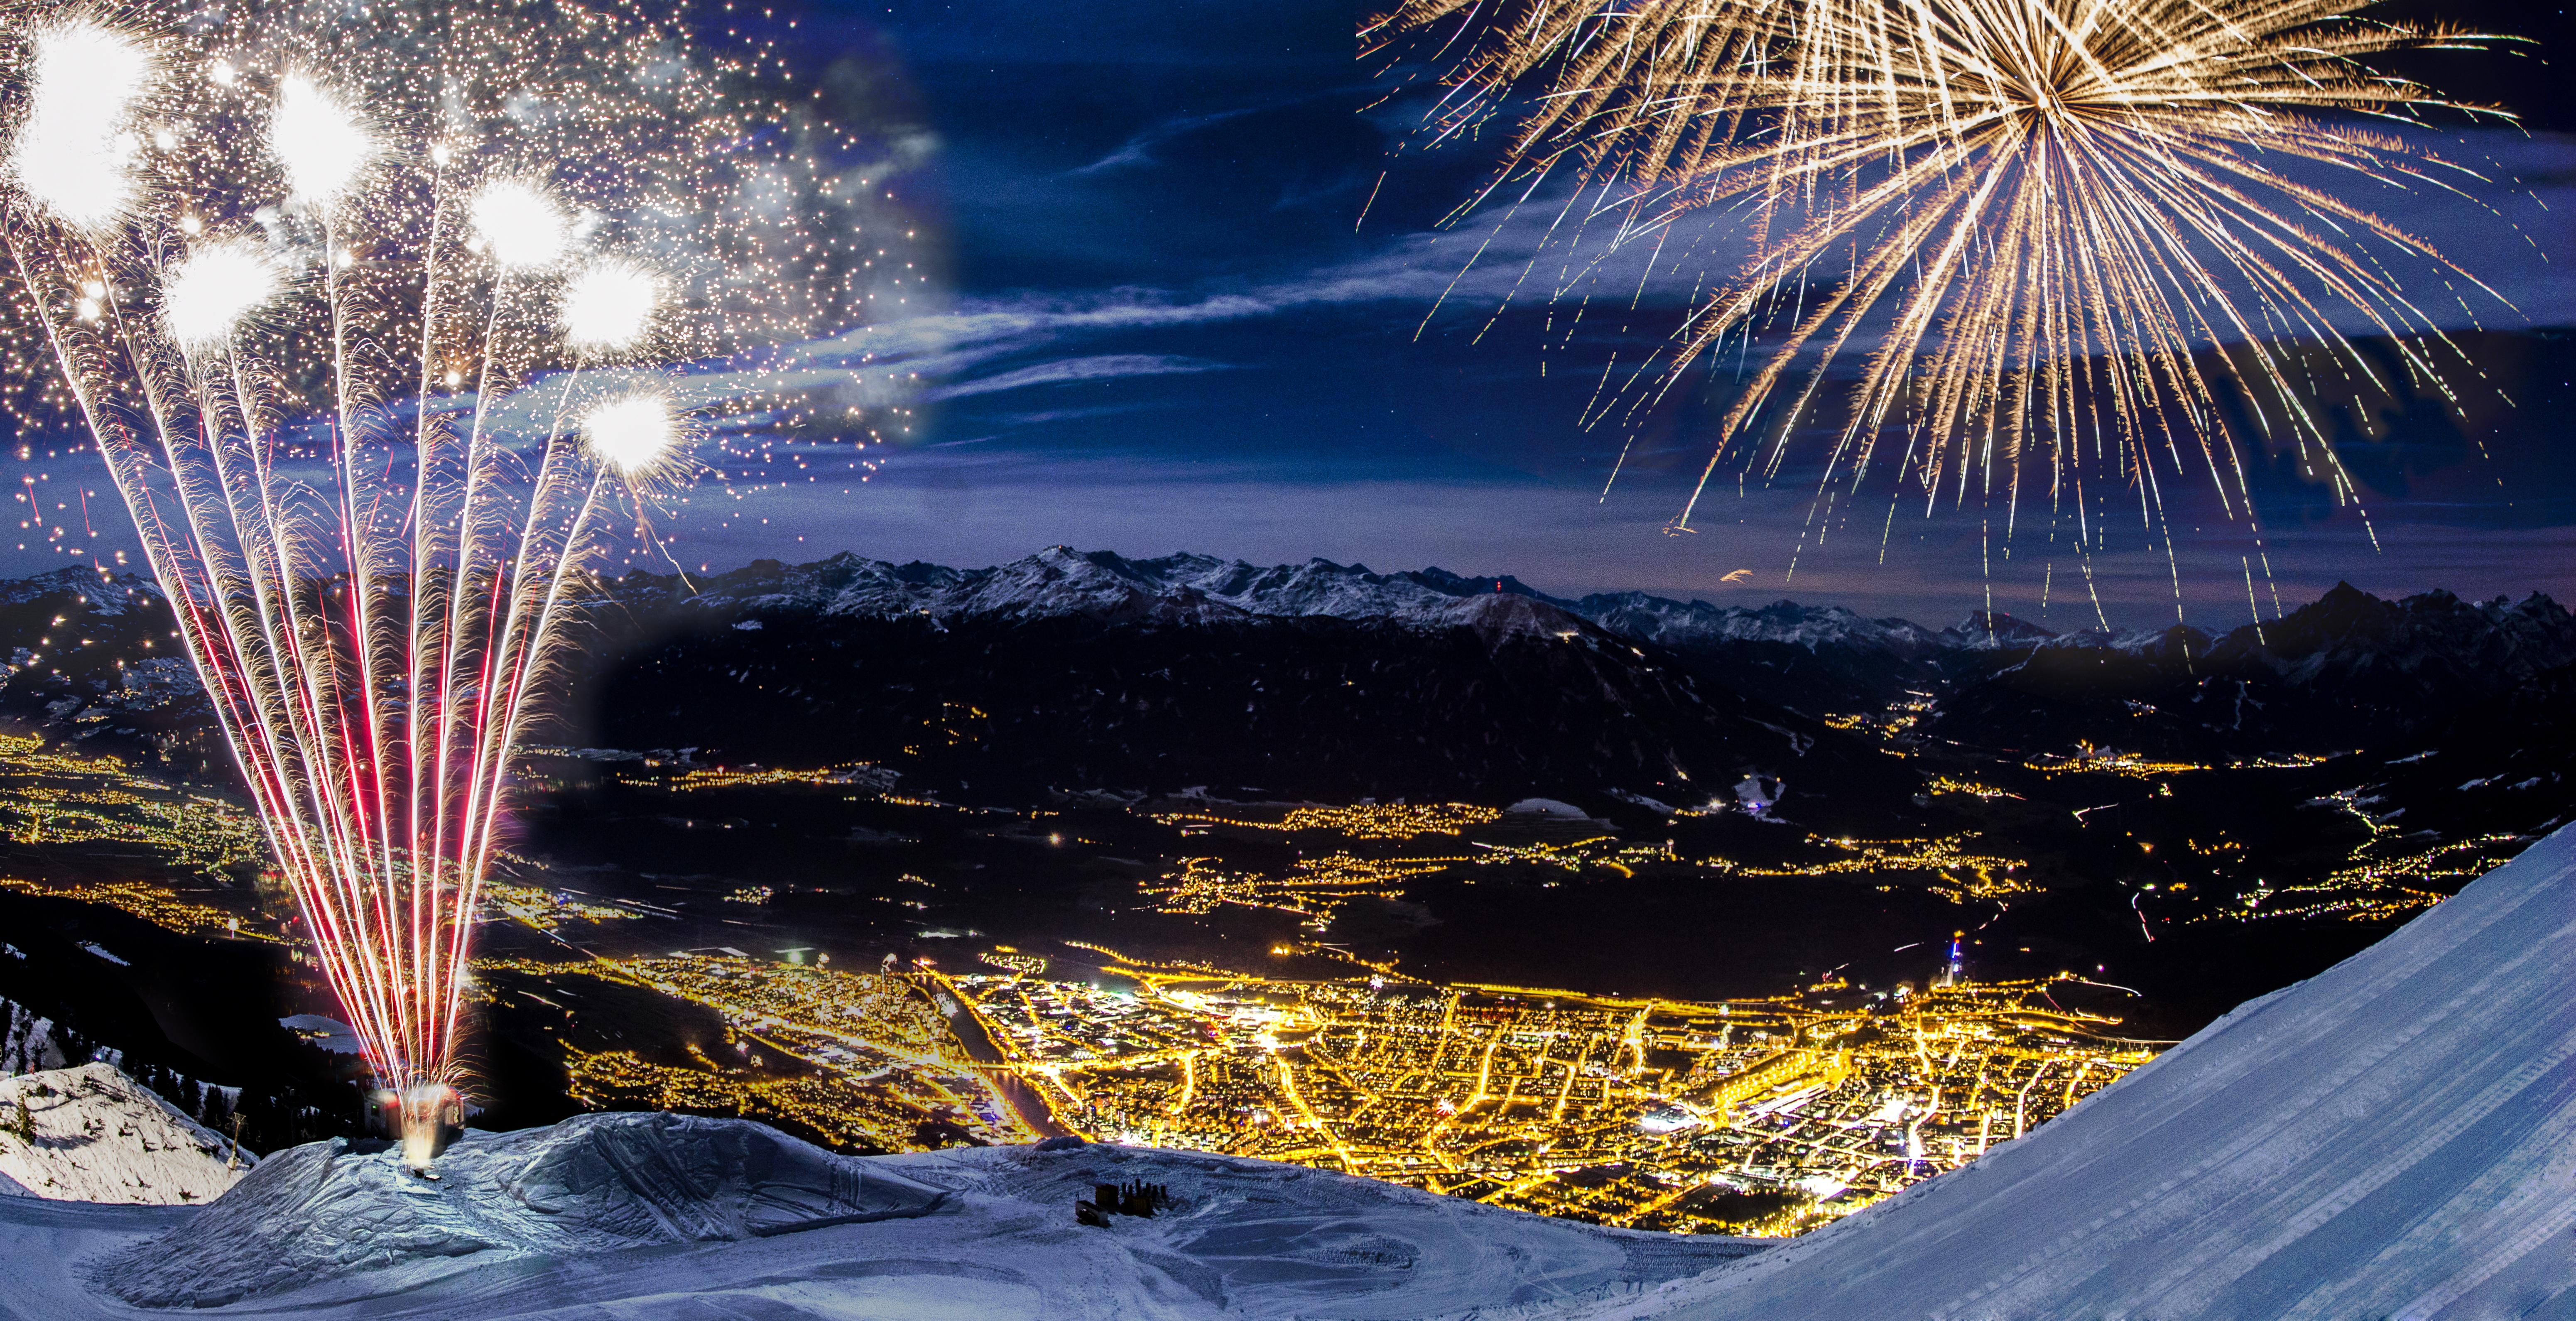 Innsbruck lädt zur spektakulärsten Outdoor-Silvesterparty der Alpen